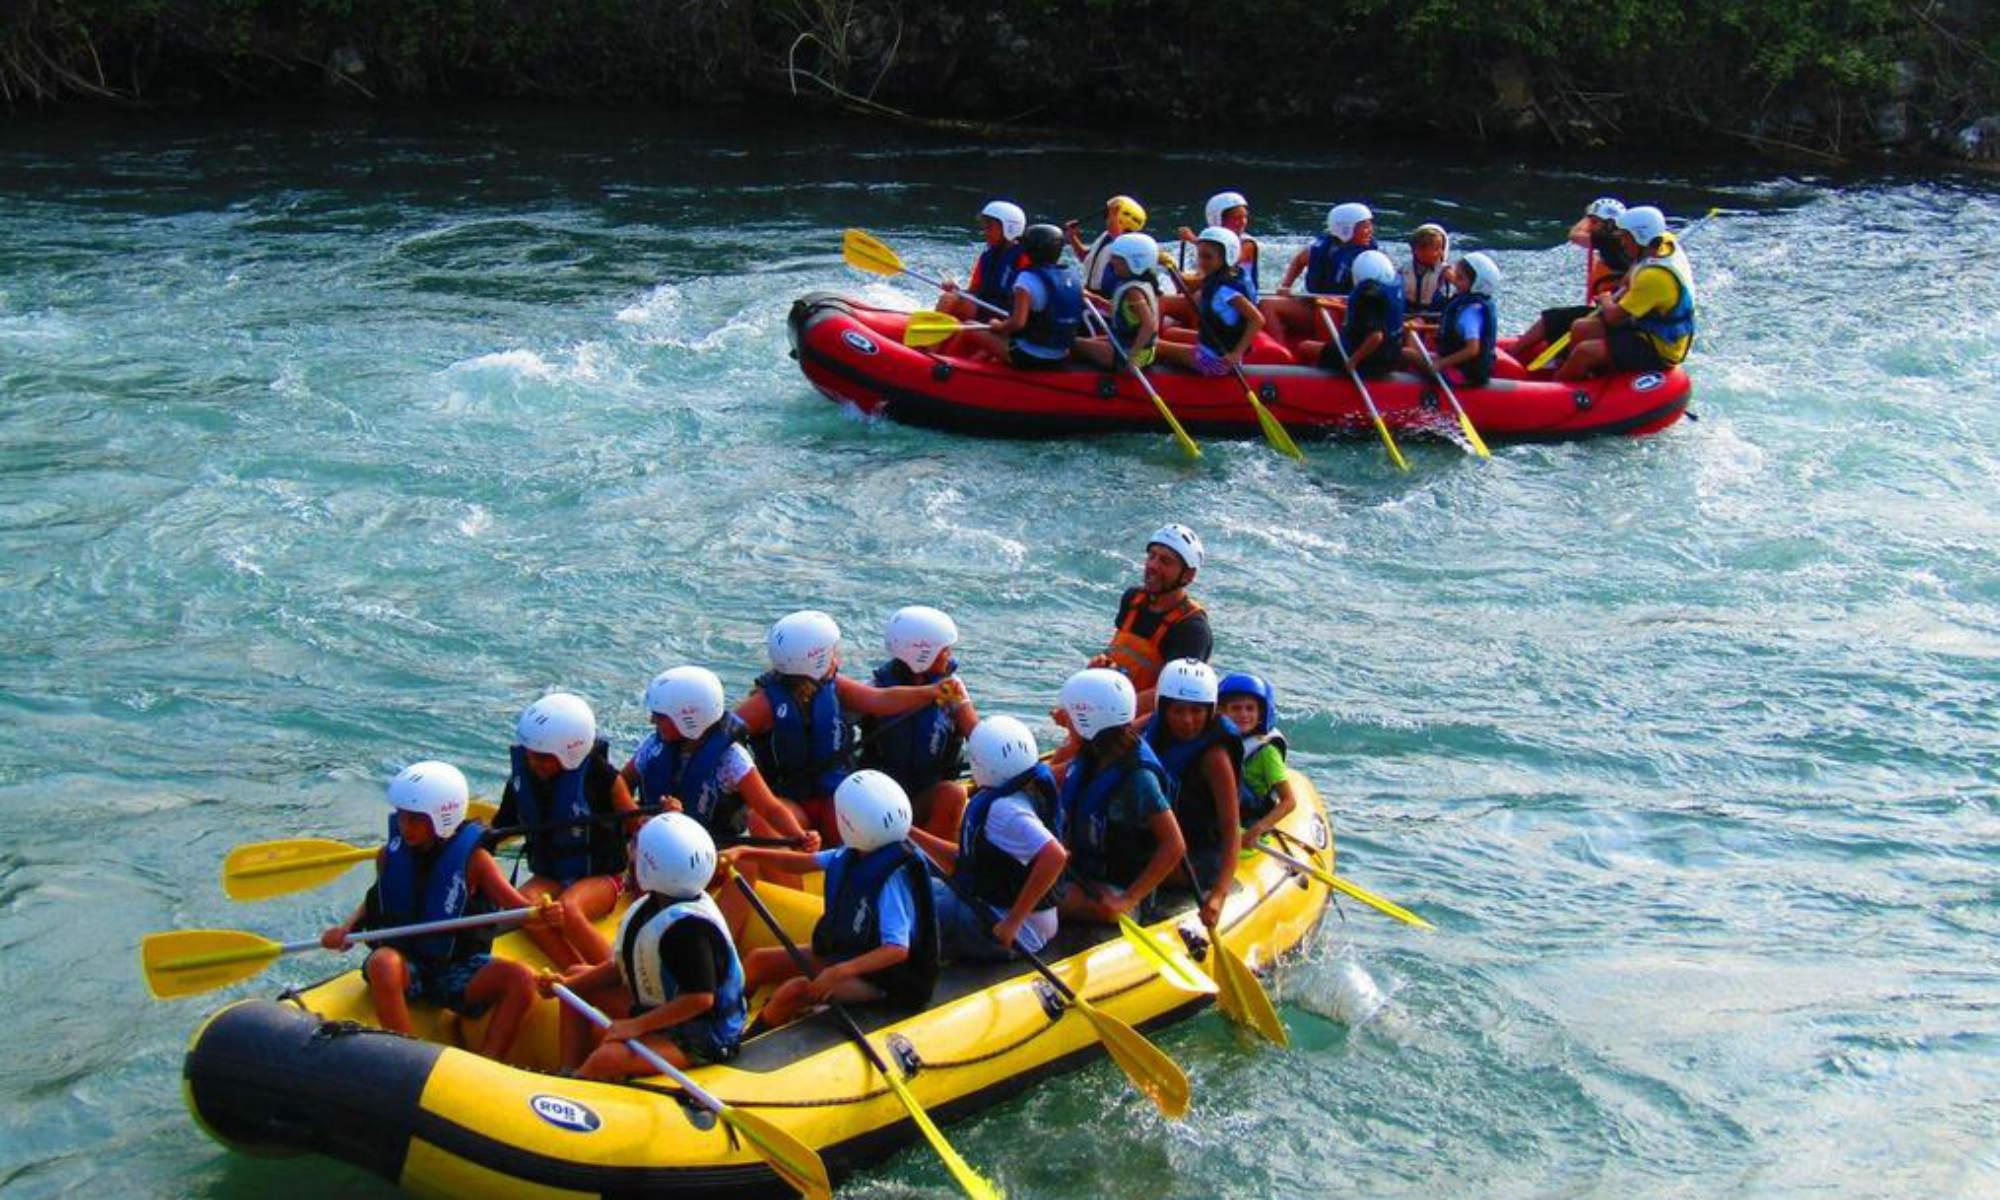 2 Gruppen befahren mit Rafting Booten den Fluss Gari in Italien.